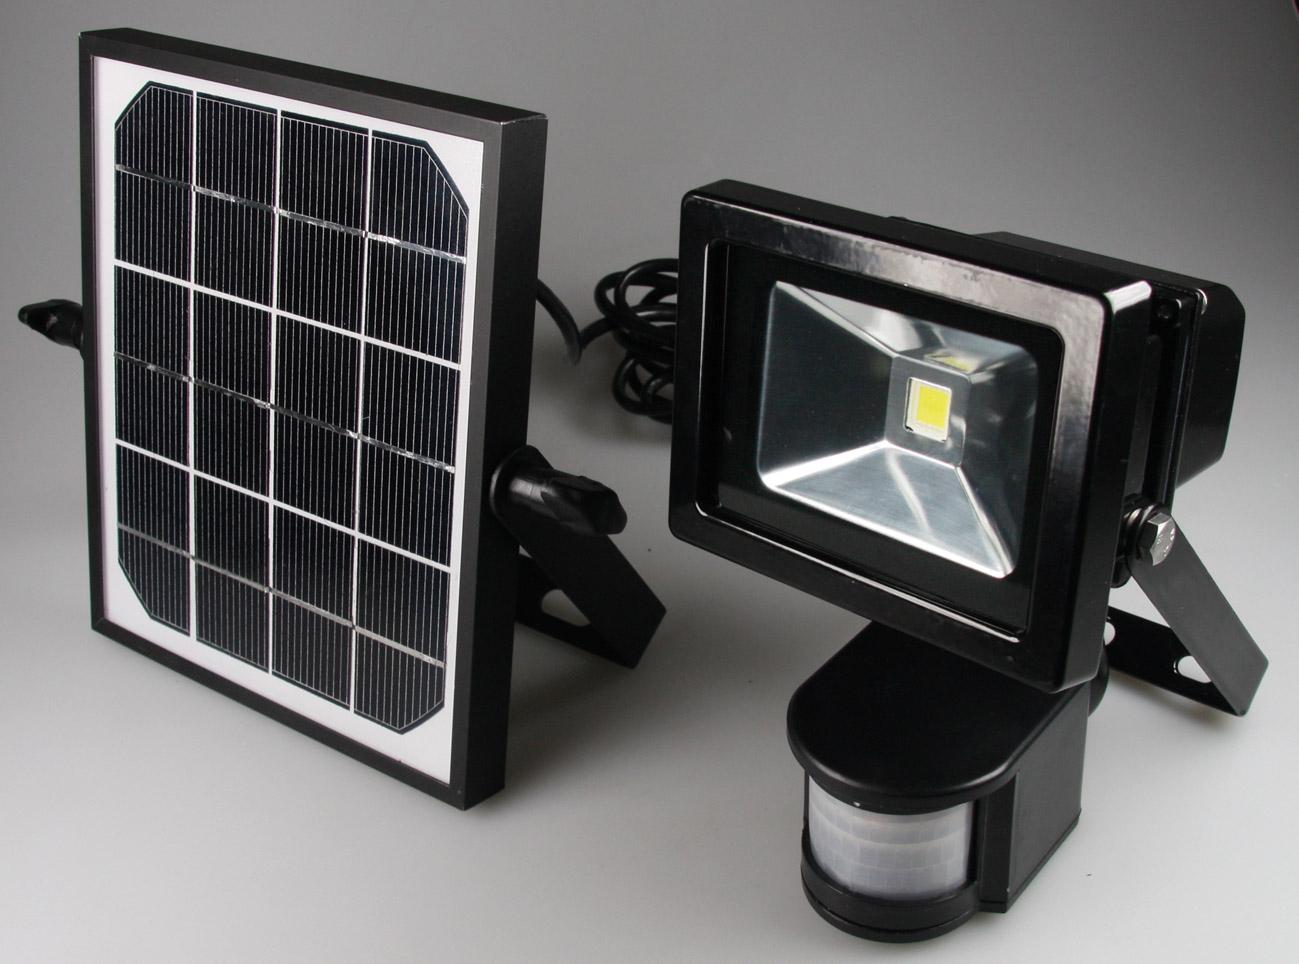 ChiliTec LED-Fluter mit Bewegungsmelder 10W, 4200K, 3W Solar-Zelle, Akku